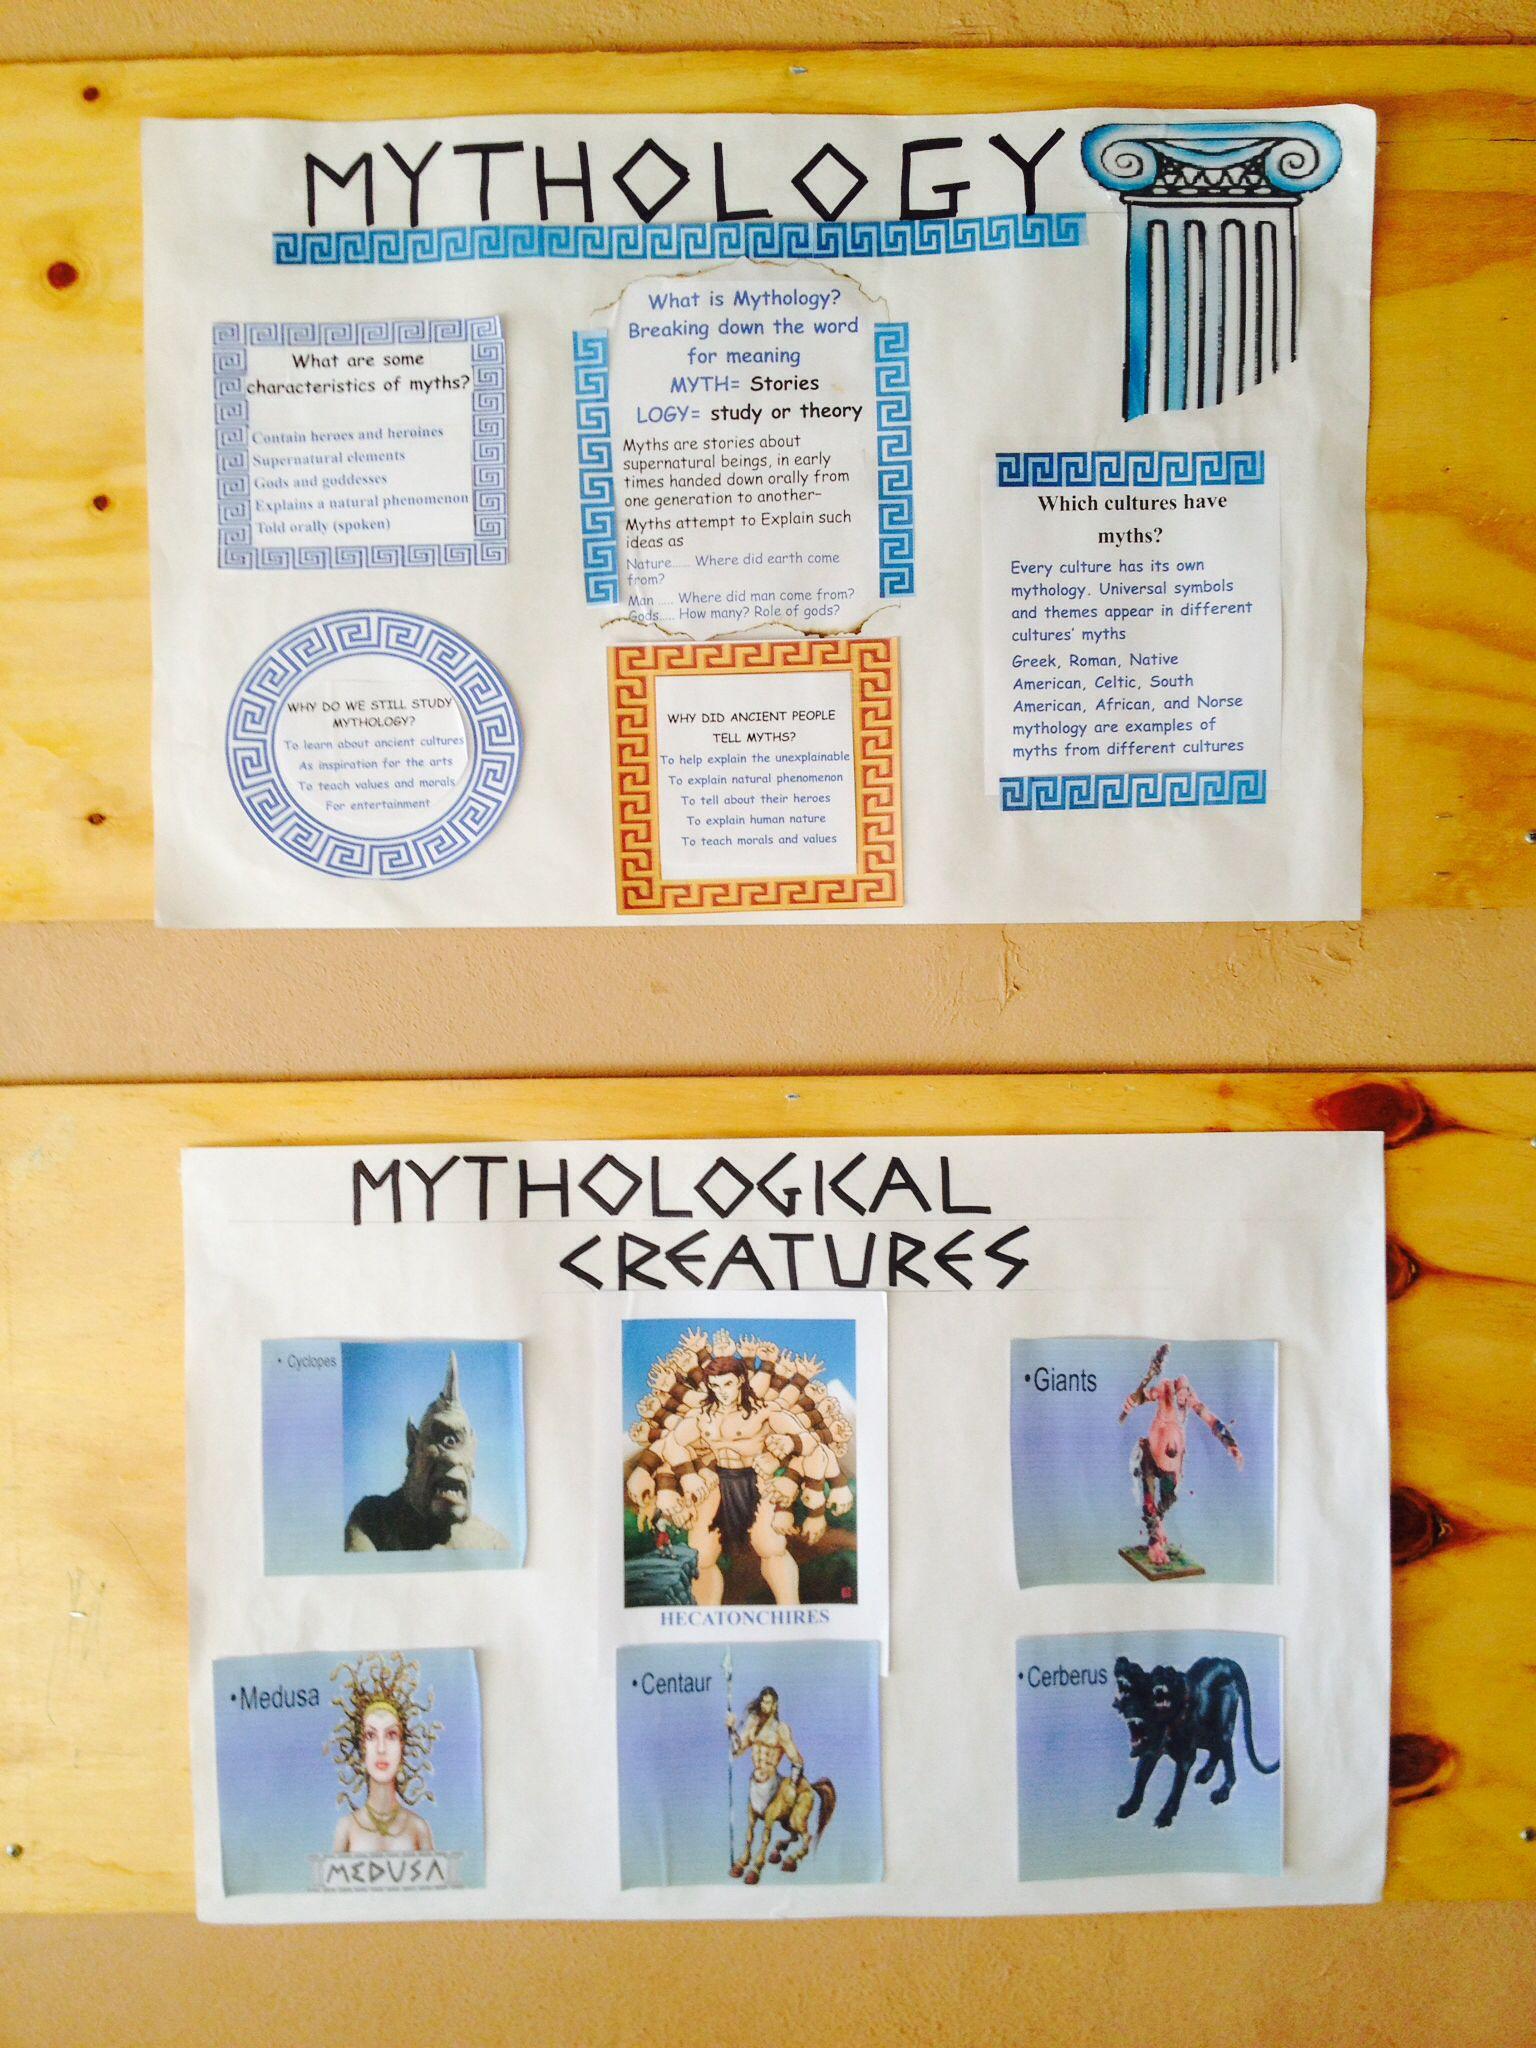 Mitologia Griega 1 | Periódico Mural | Pinterest